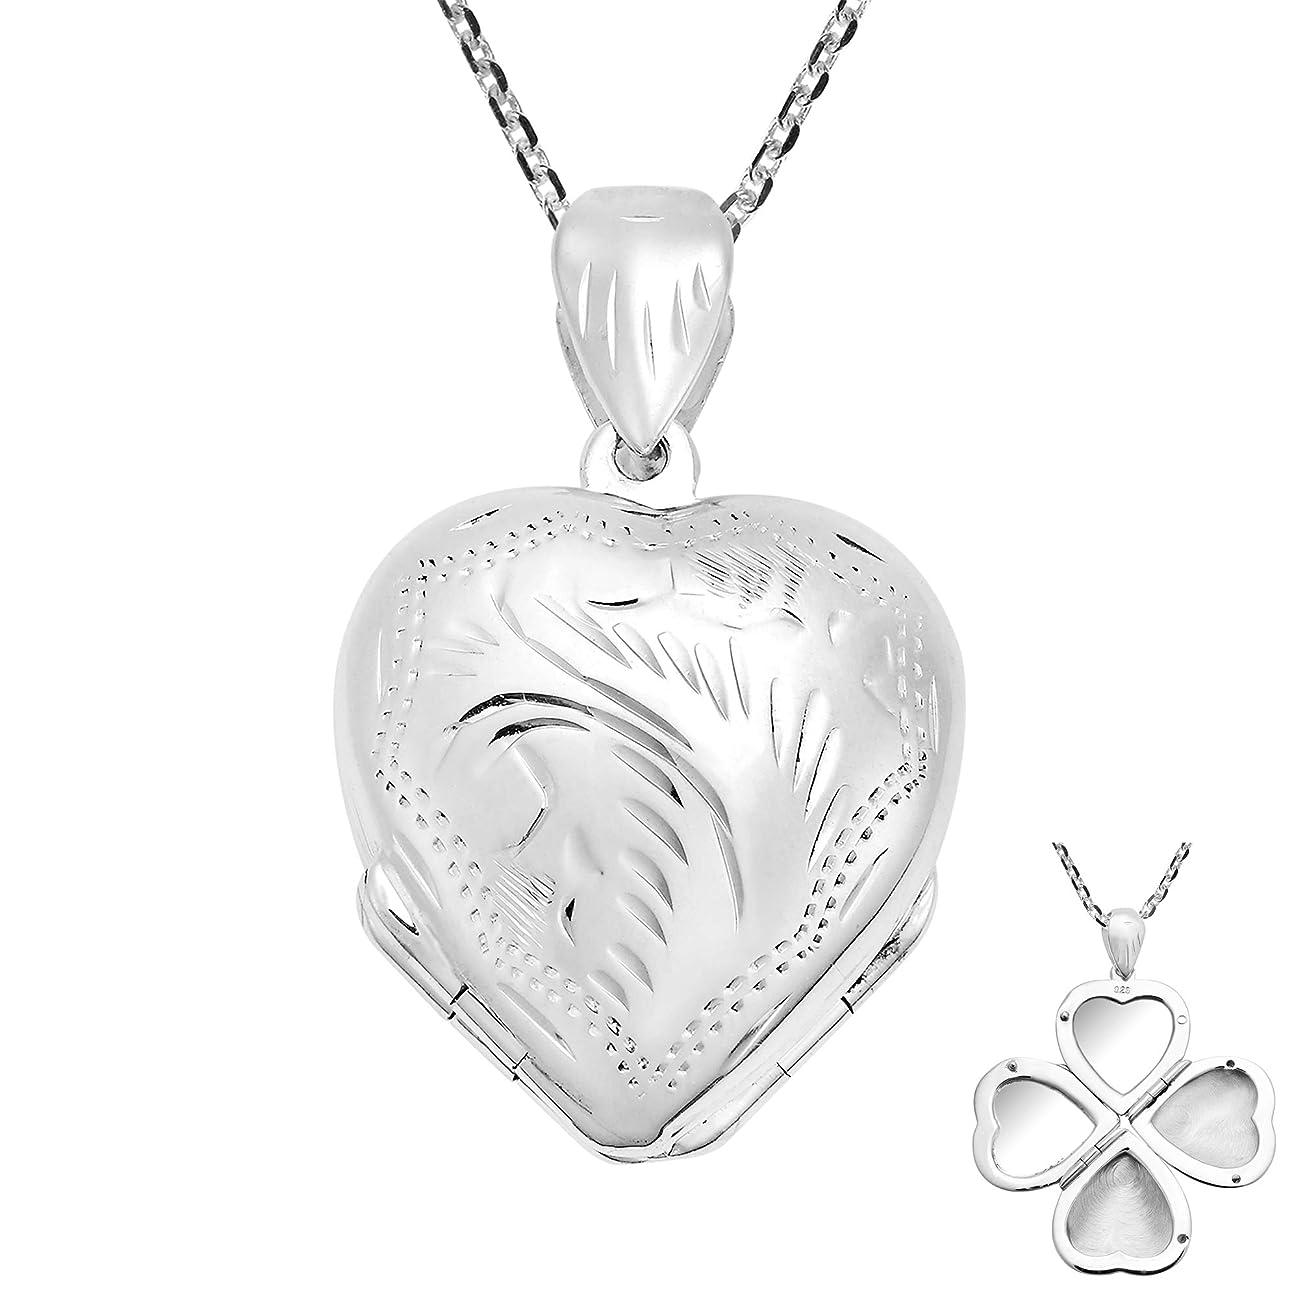 AeraVida Amazing Four-Piece Folding Heart .925 Sterling Silver Locket Necklace